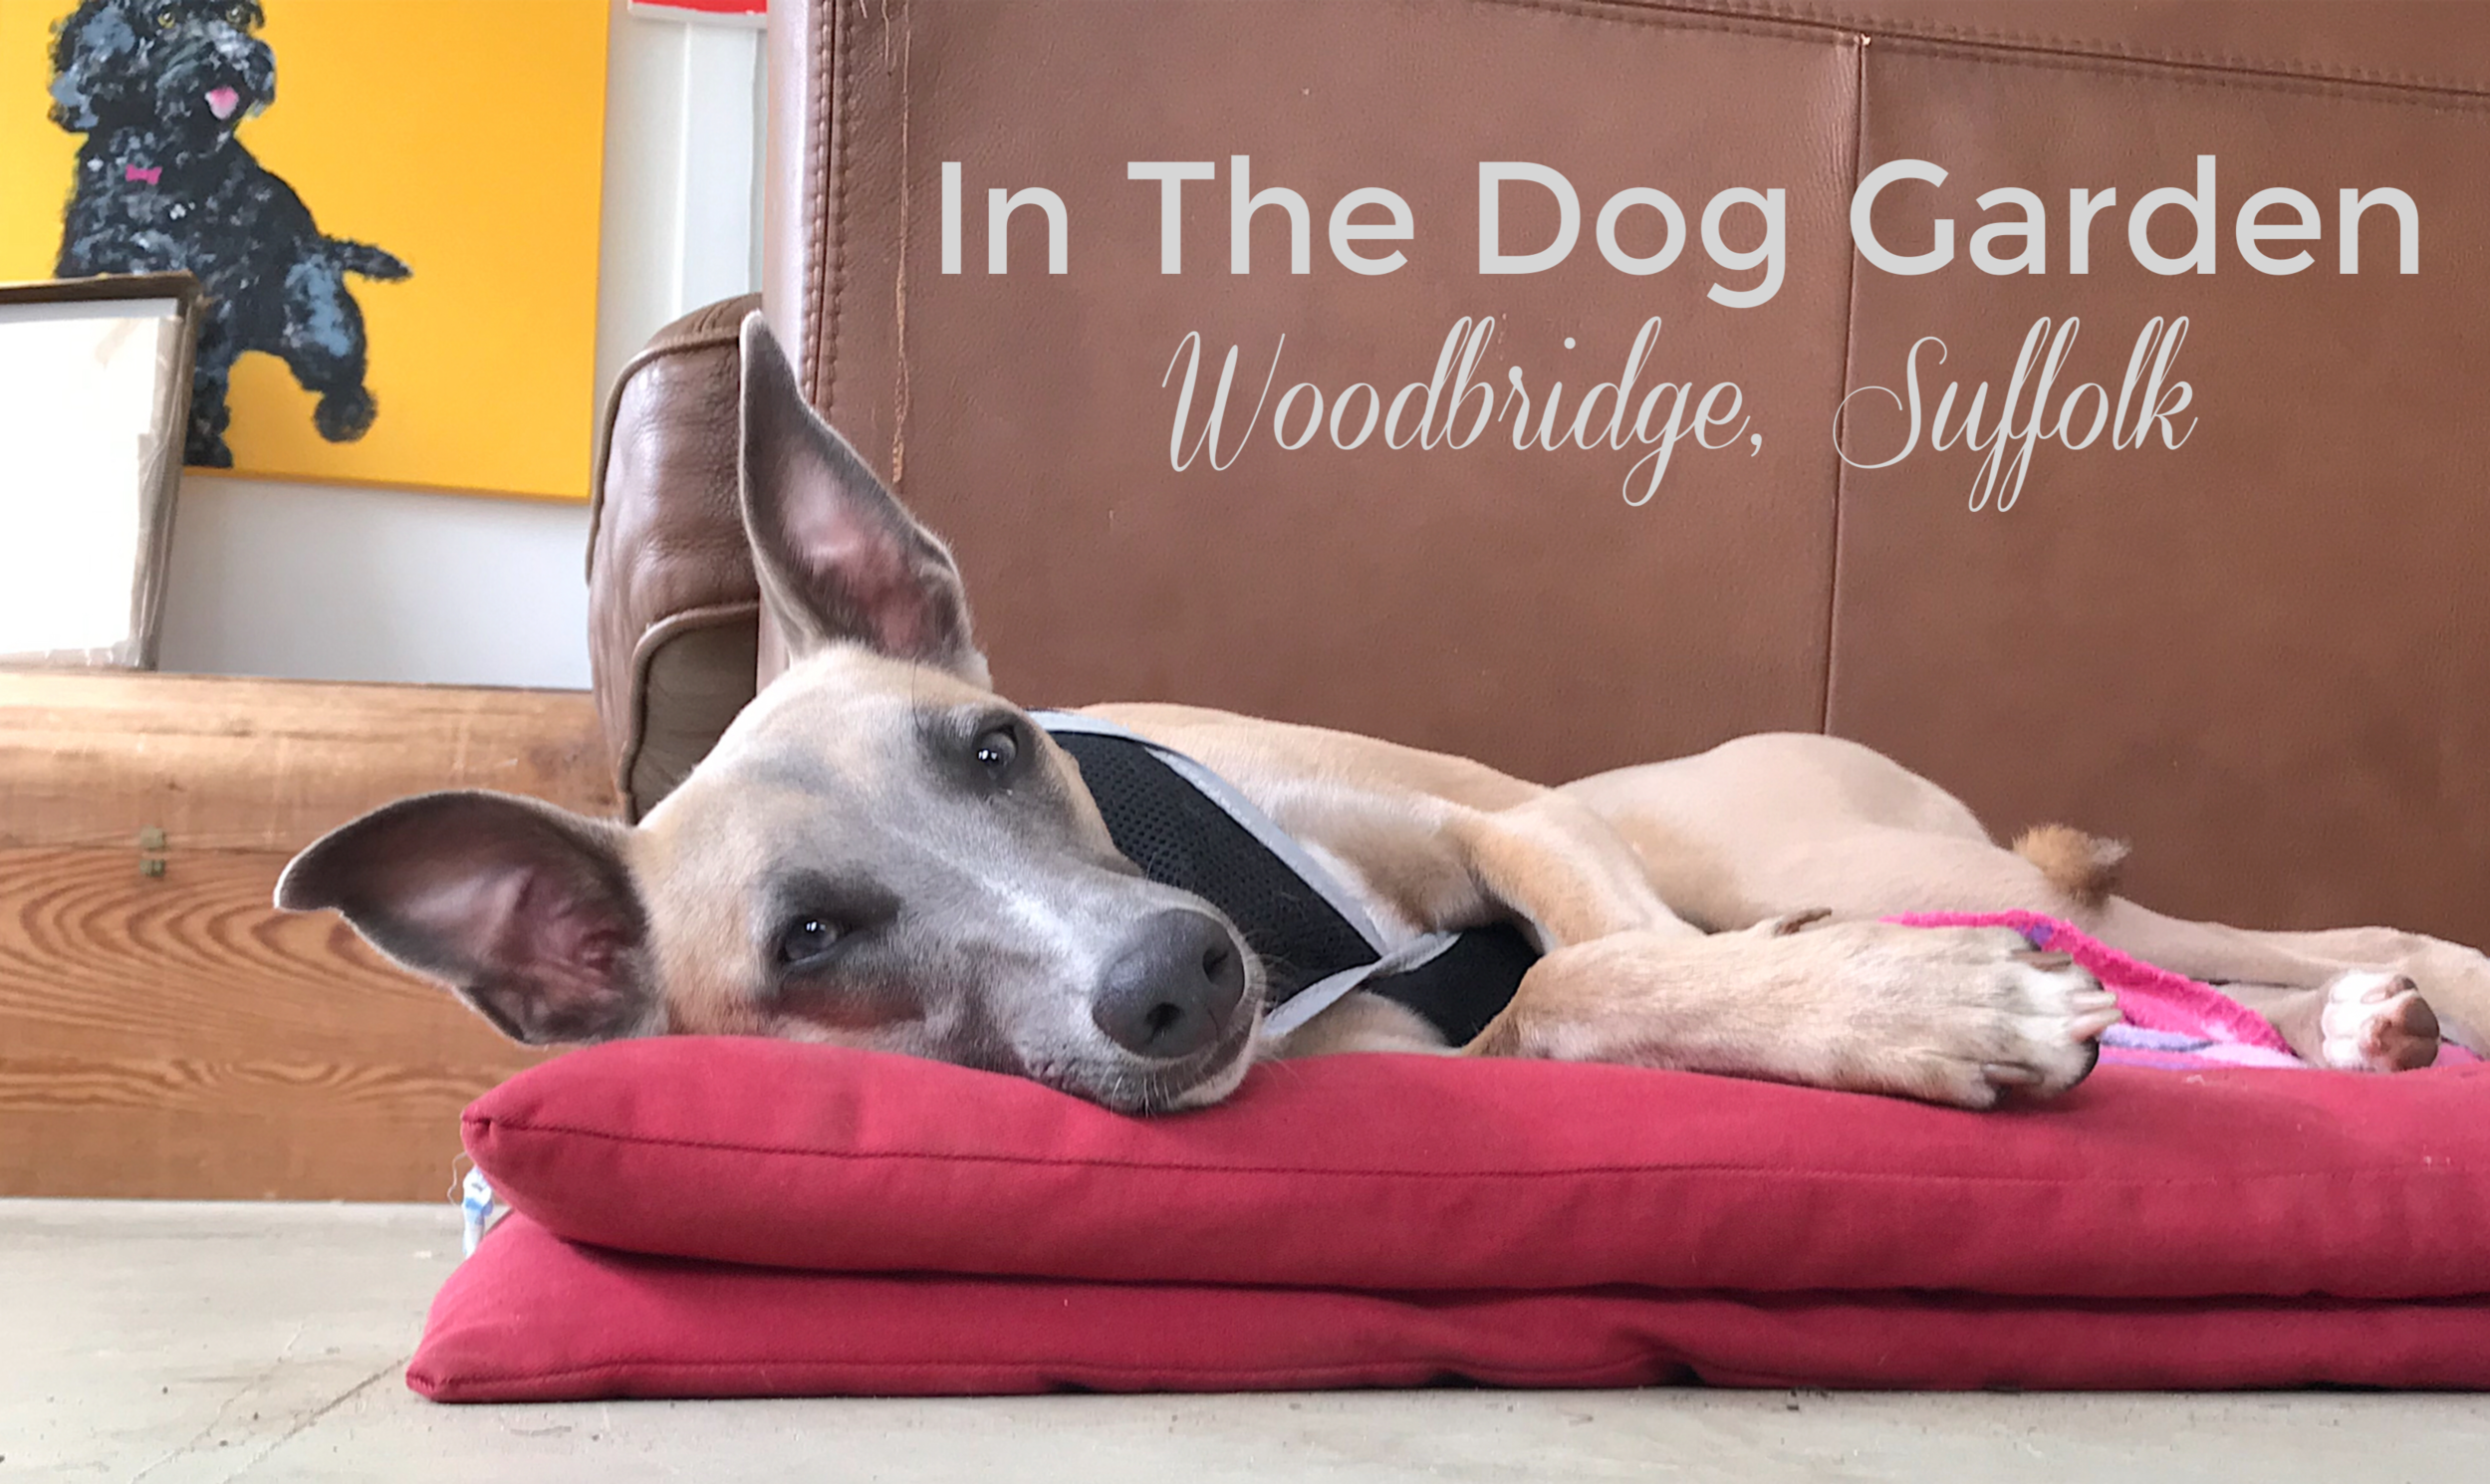 The Dog Garden, Woodbridge, Suffolk Dog Boarding